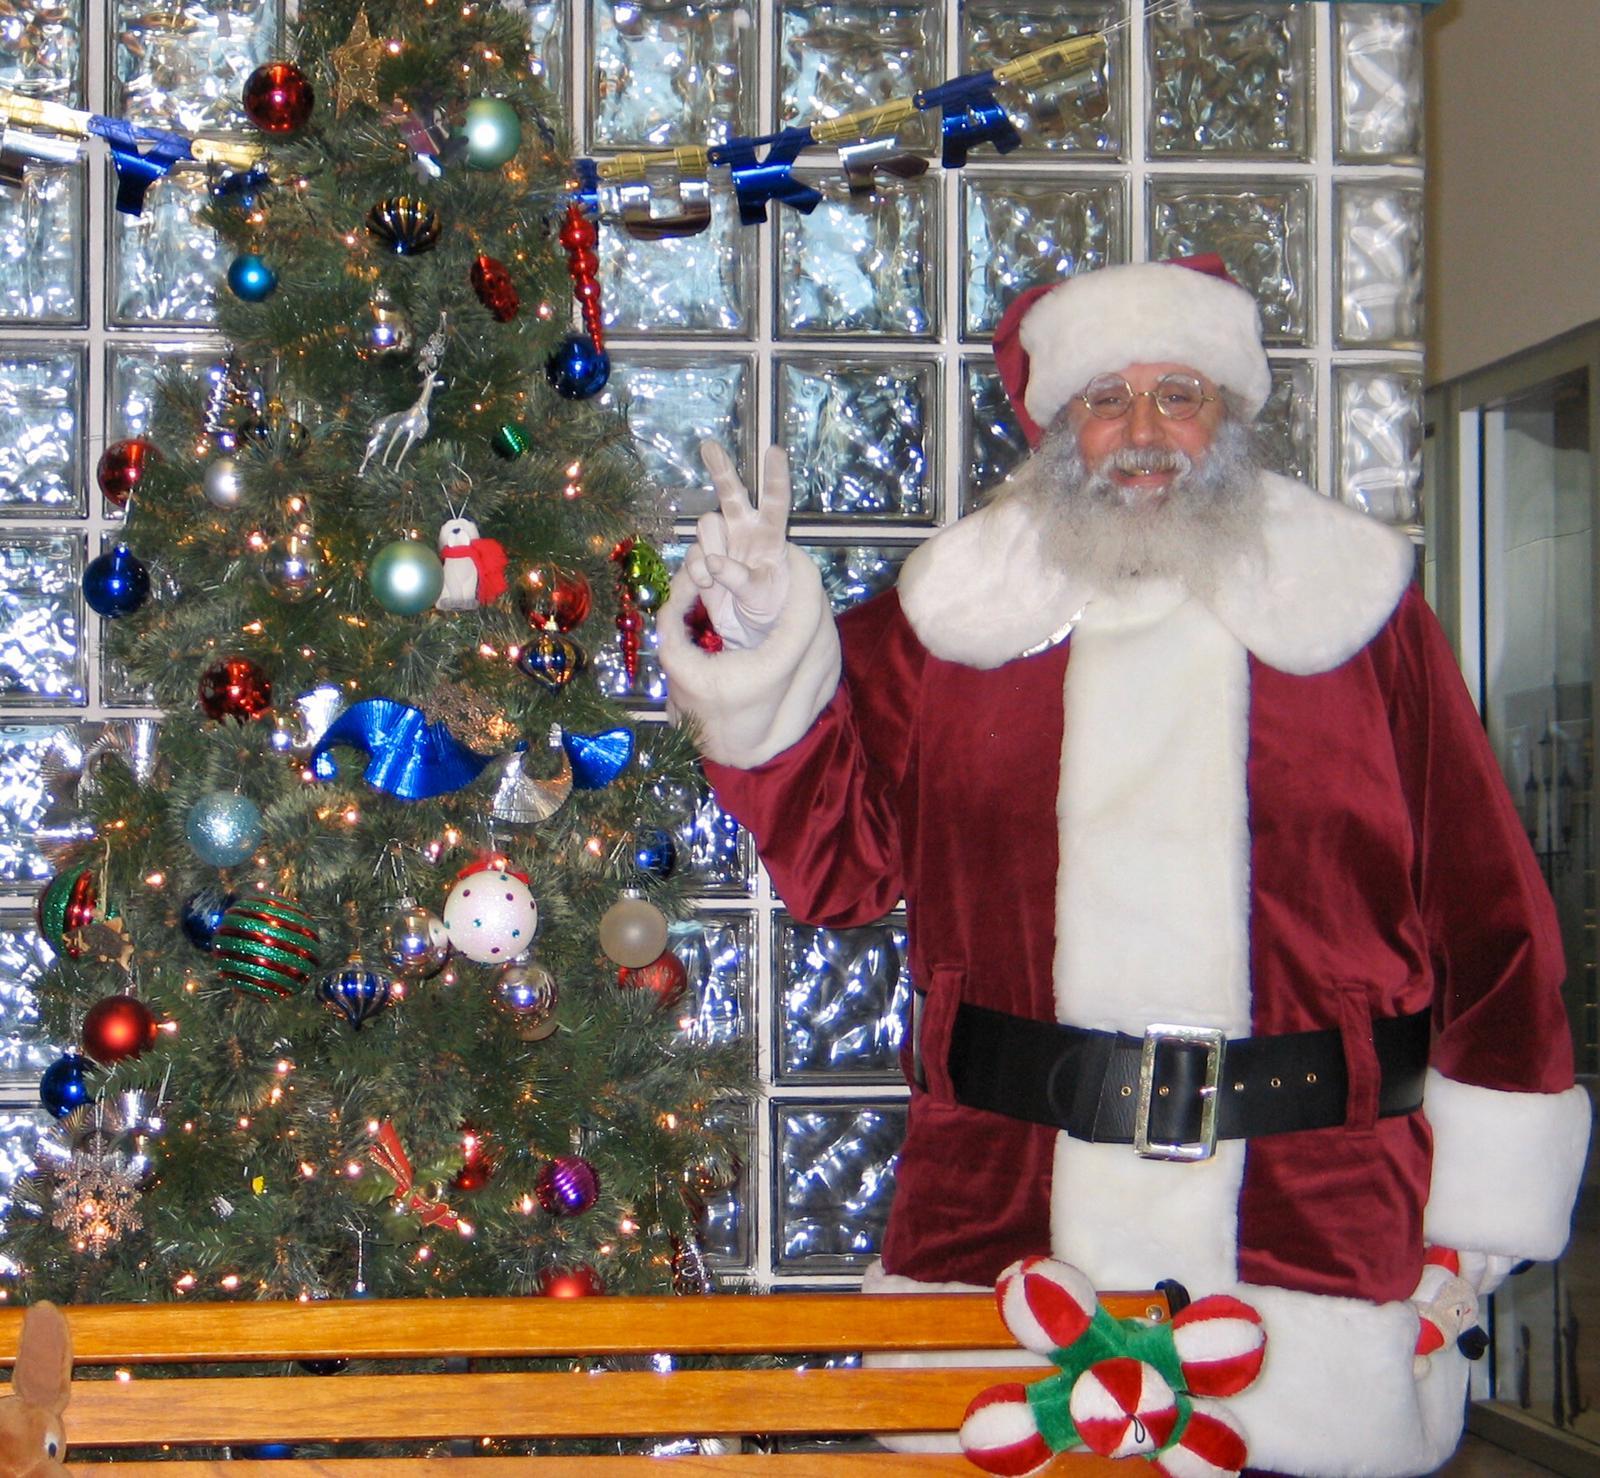 Real beard Santa Claus